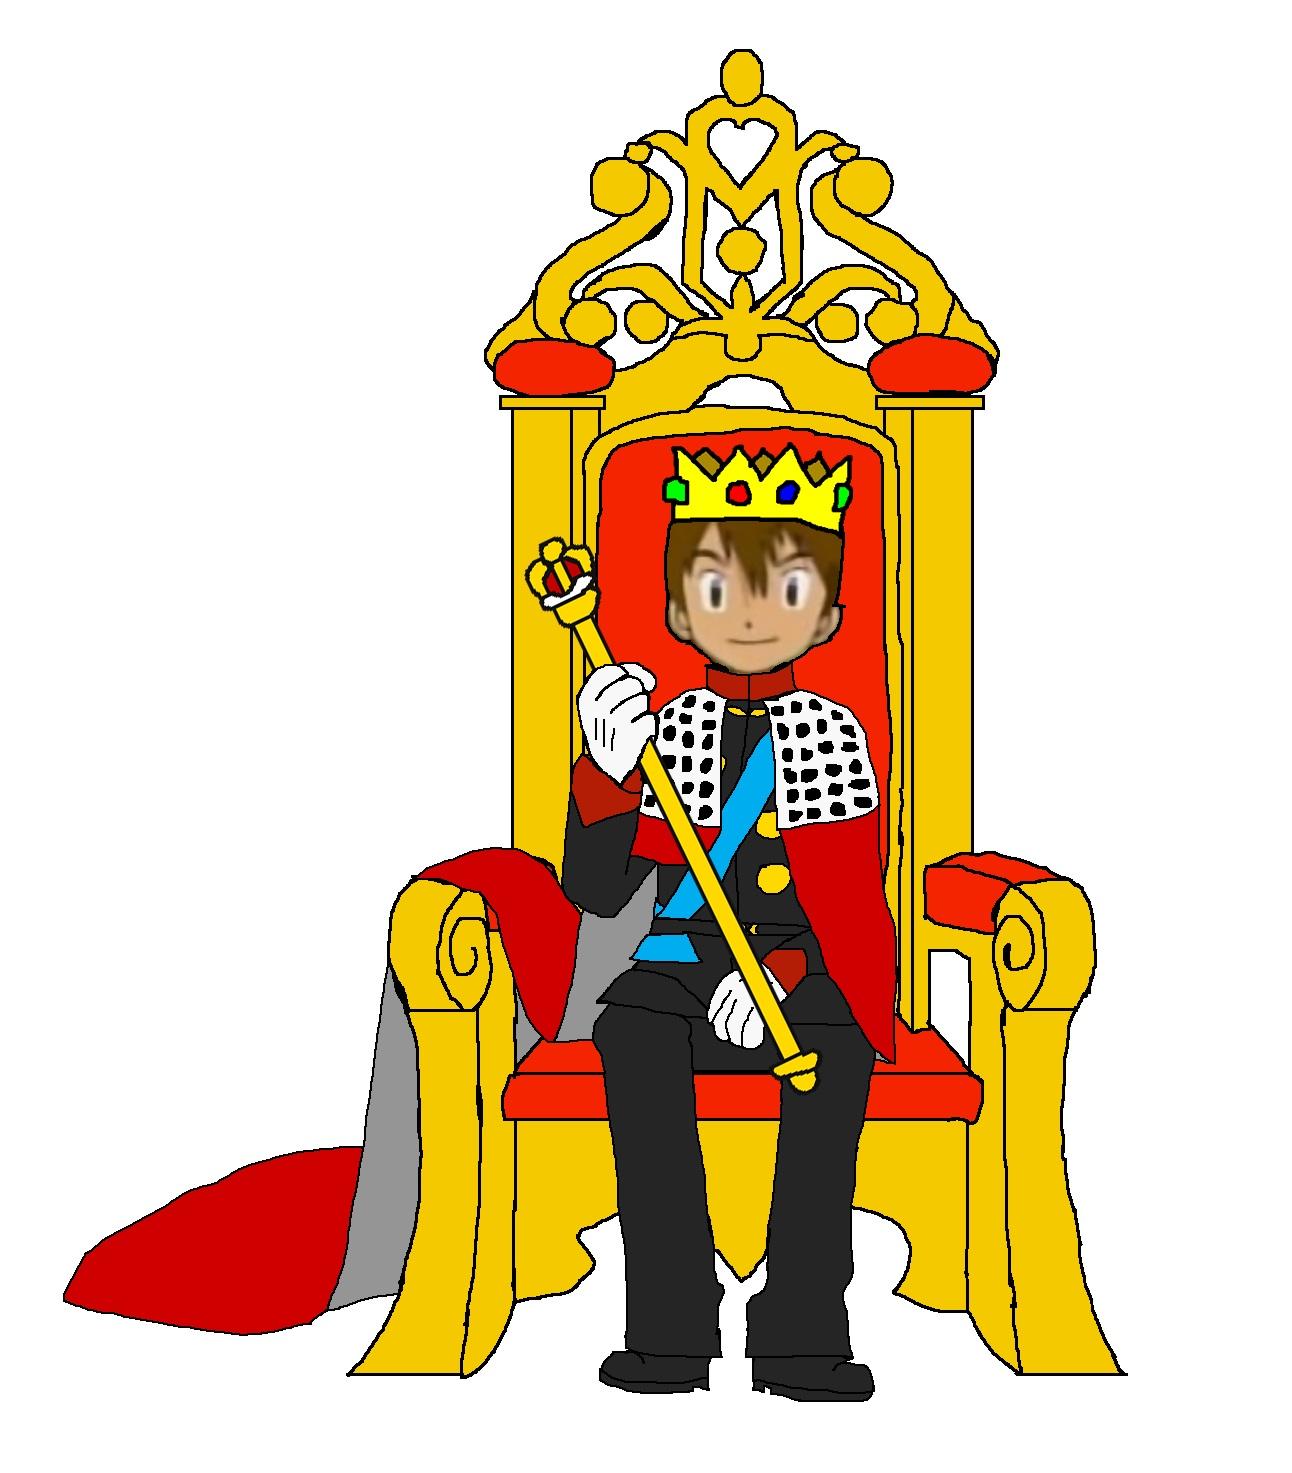 Demon clipart evil king. Free lion cliparts download